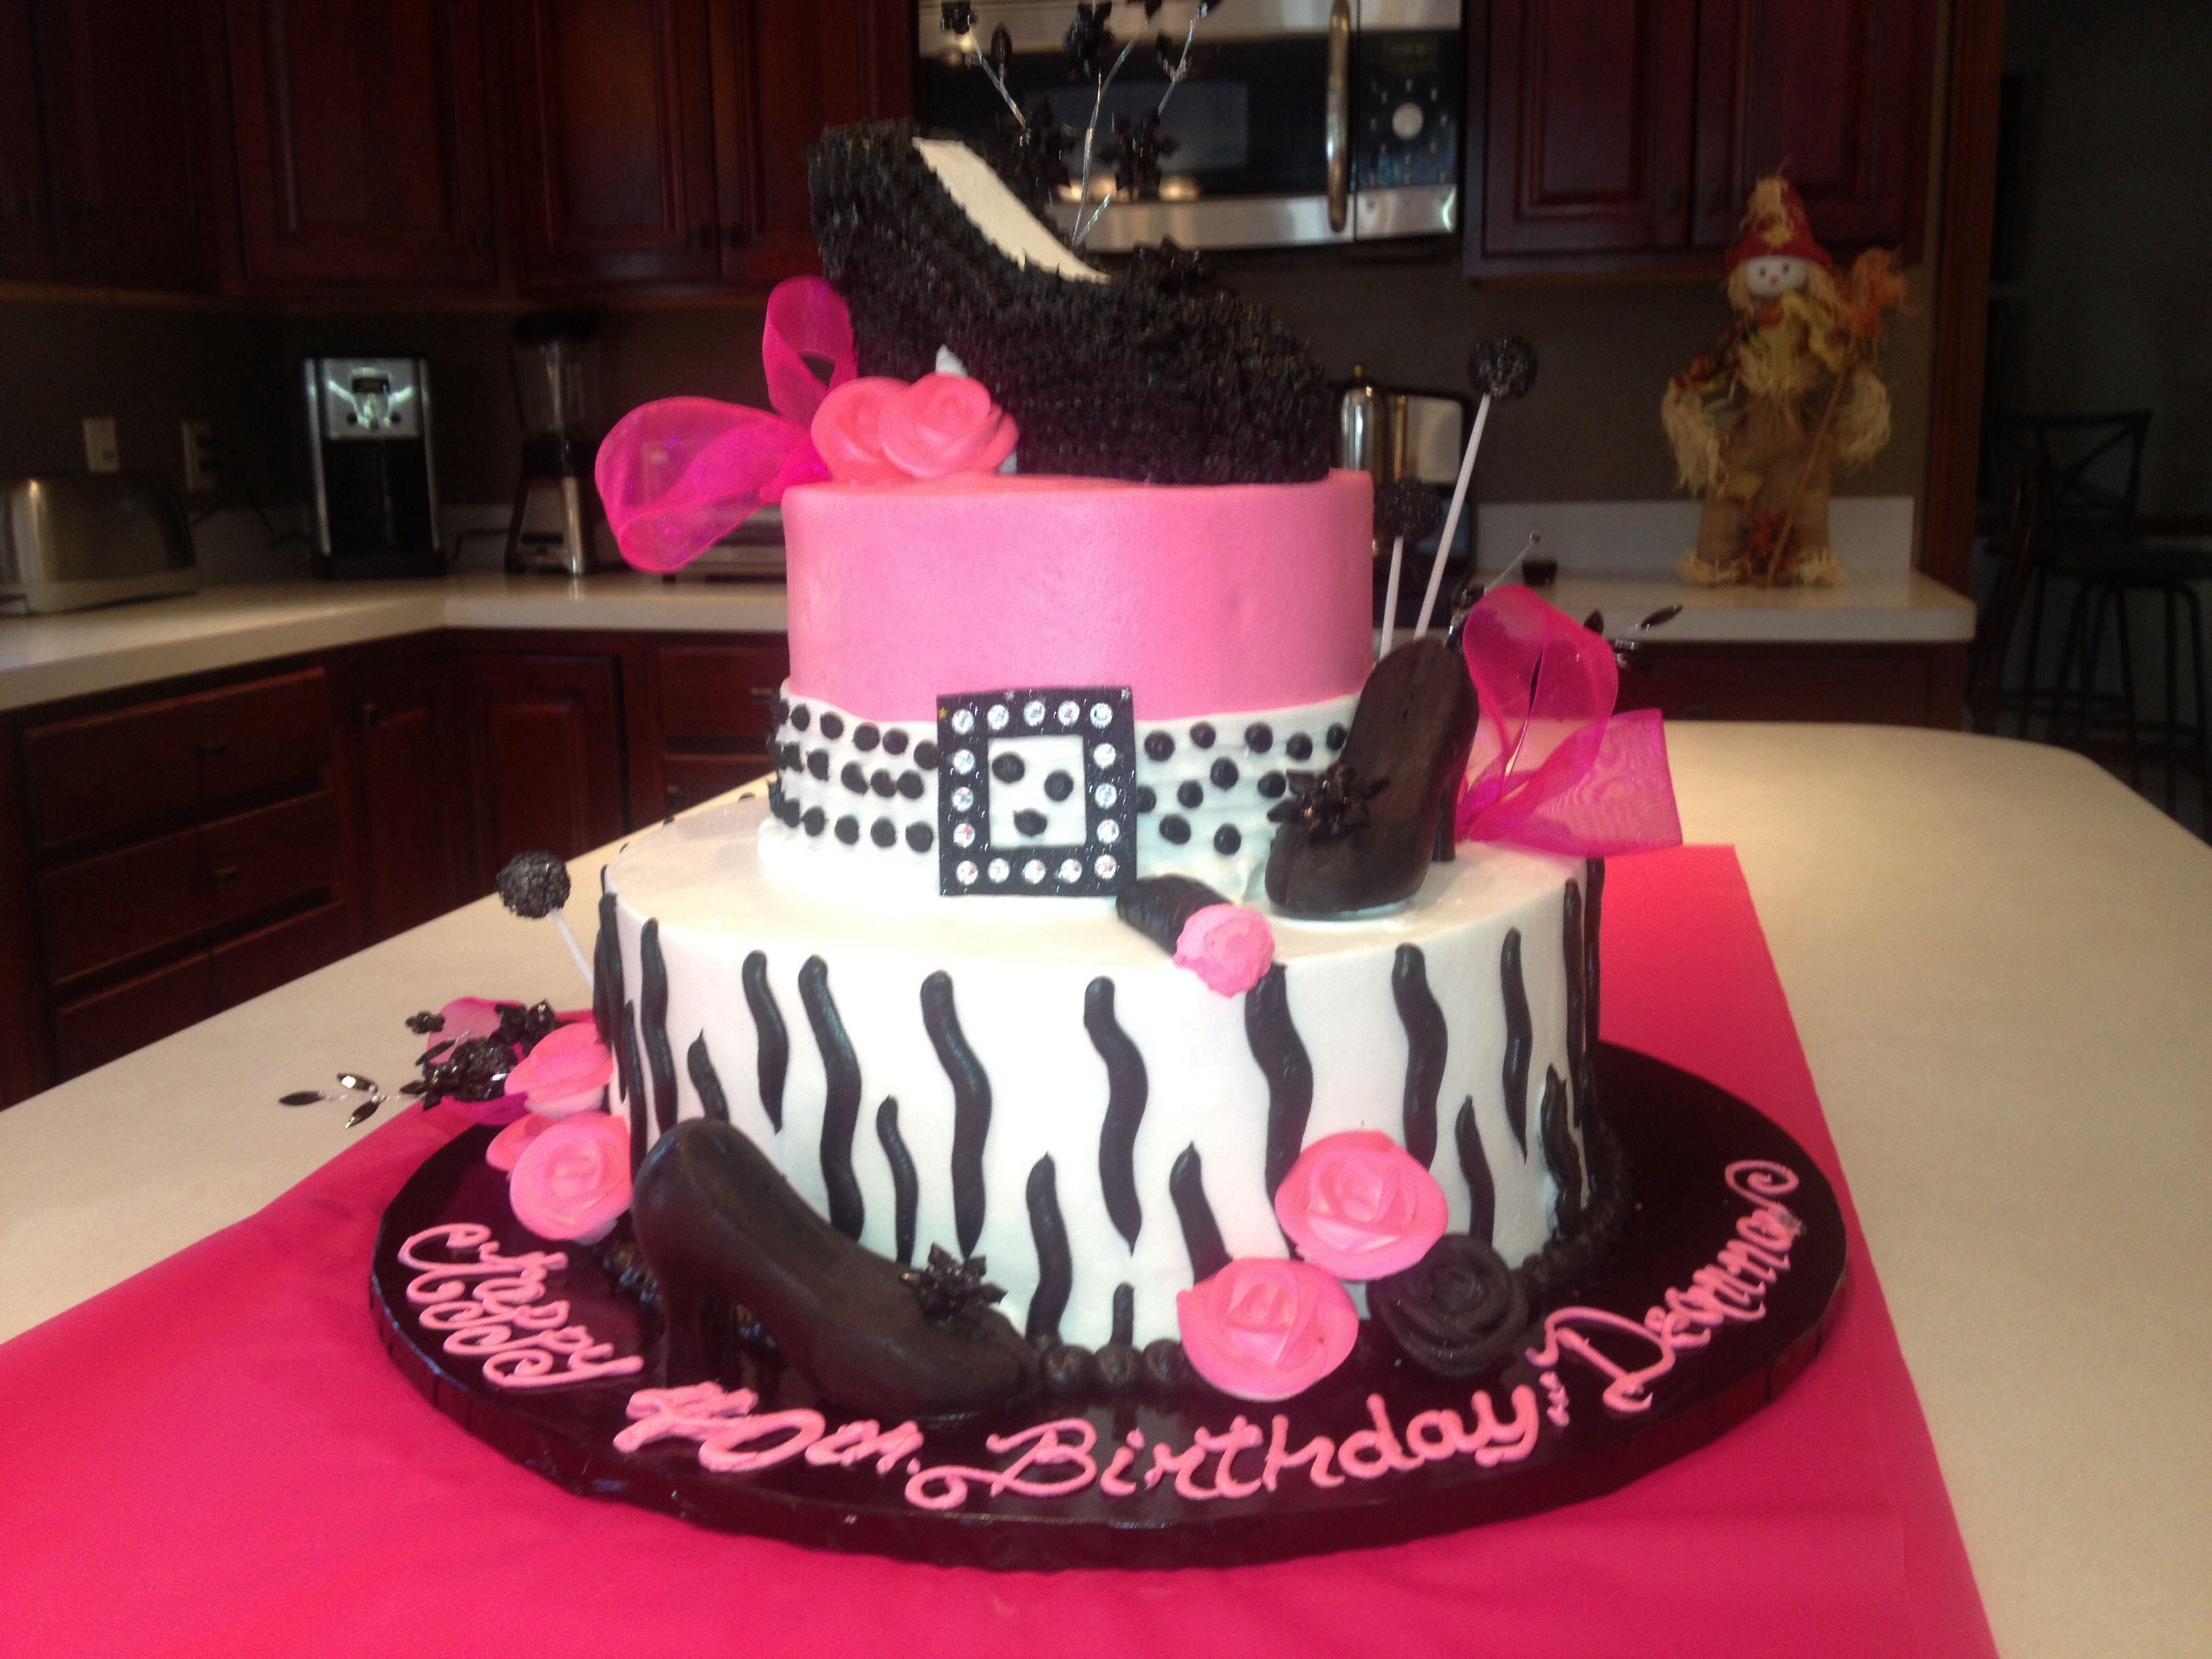 Superb Diva Birthday Cake Diva Birthday Cakes Cake Birthday Cake Funny Birthday Cards Online Elaedamsfinfo